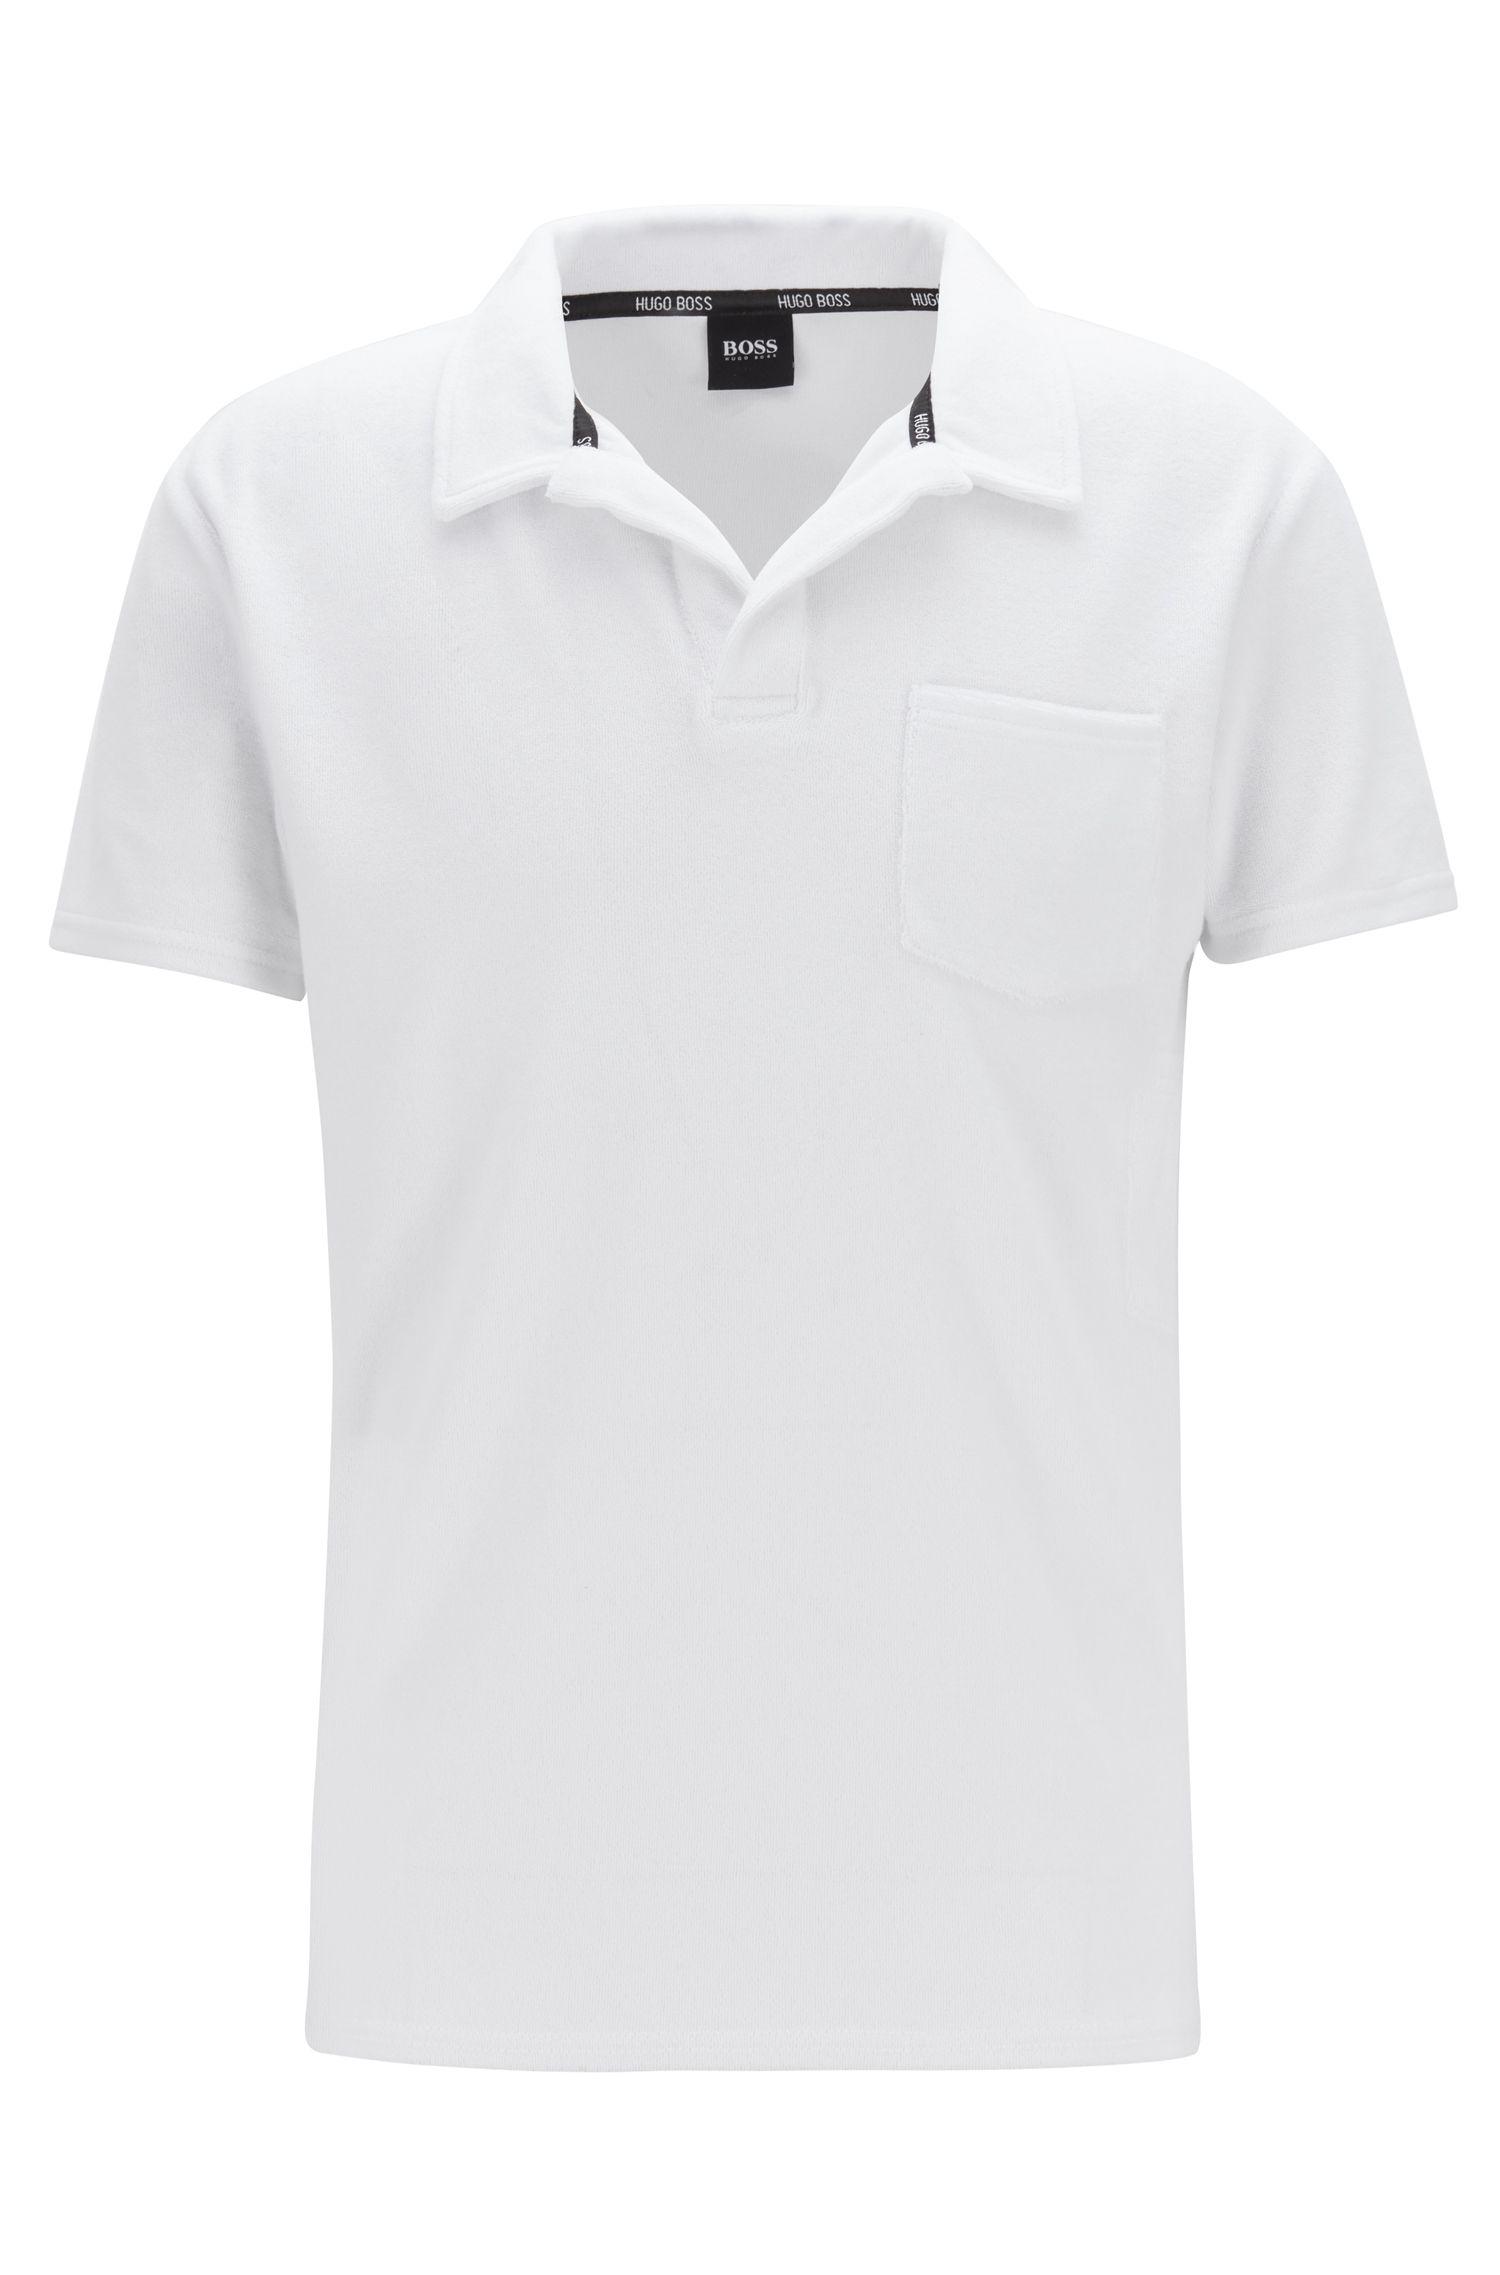 Beach polo shirt in cotton-blend terry, White